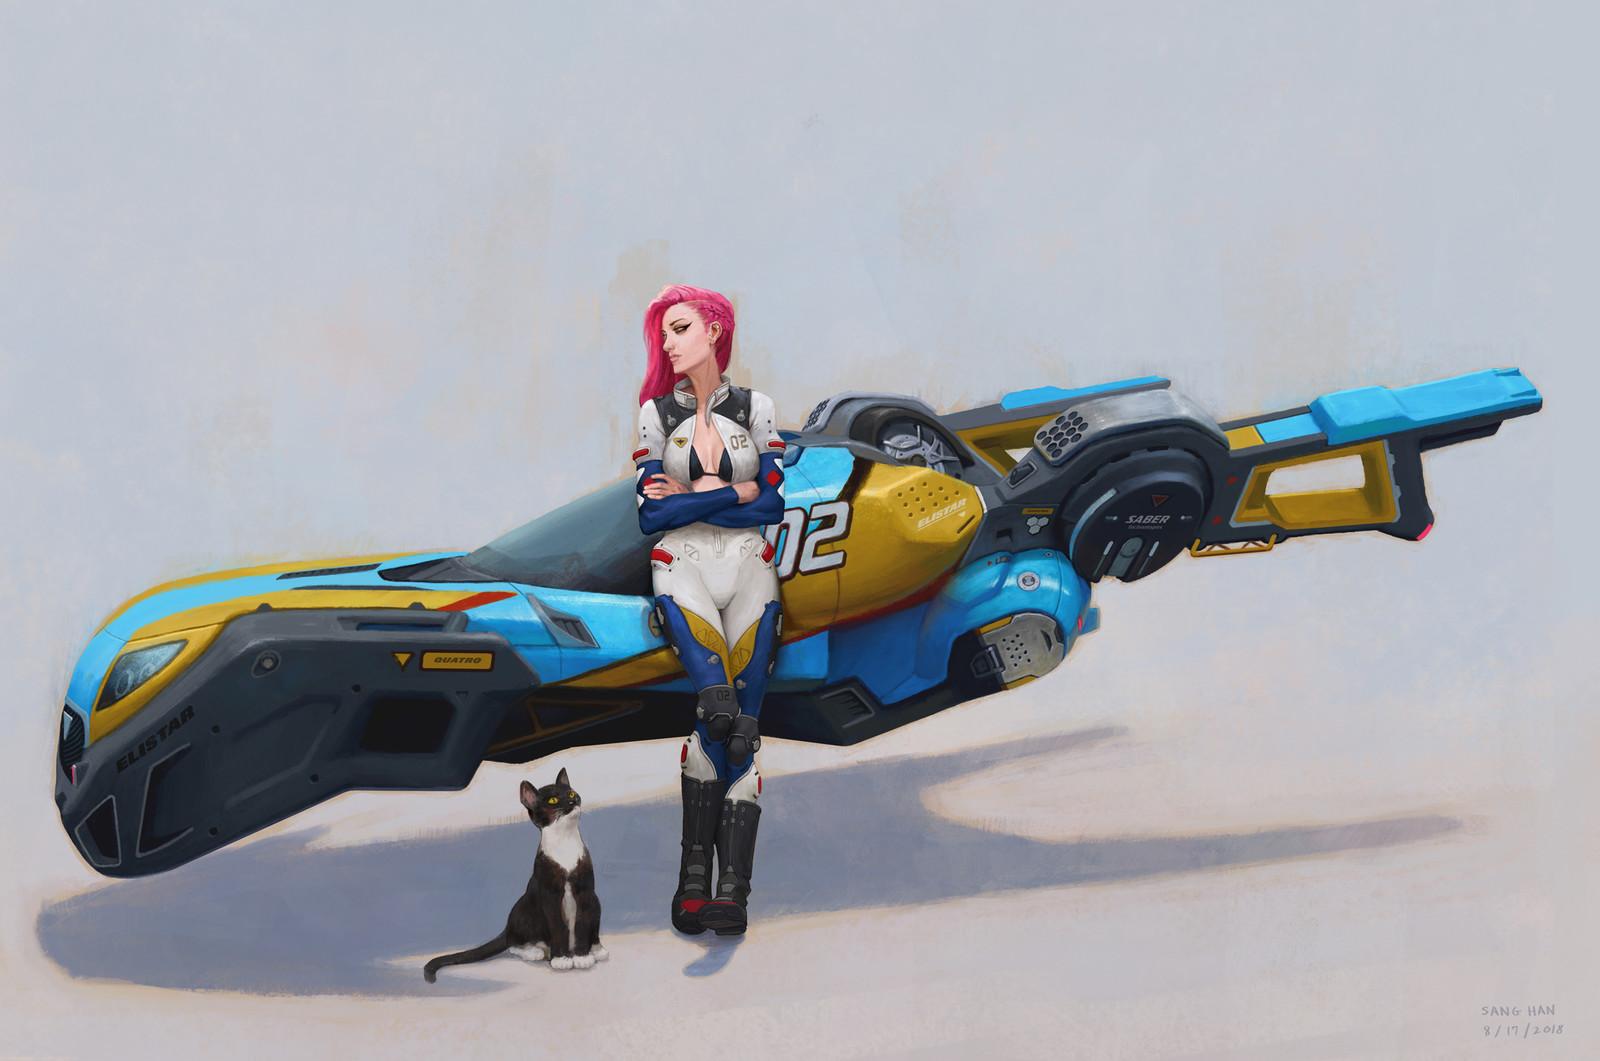 Racer No.02